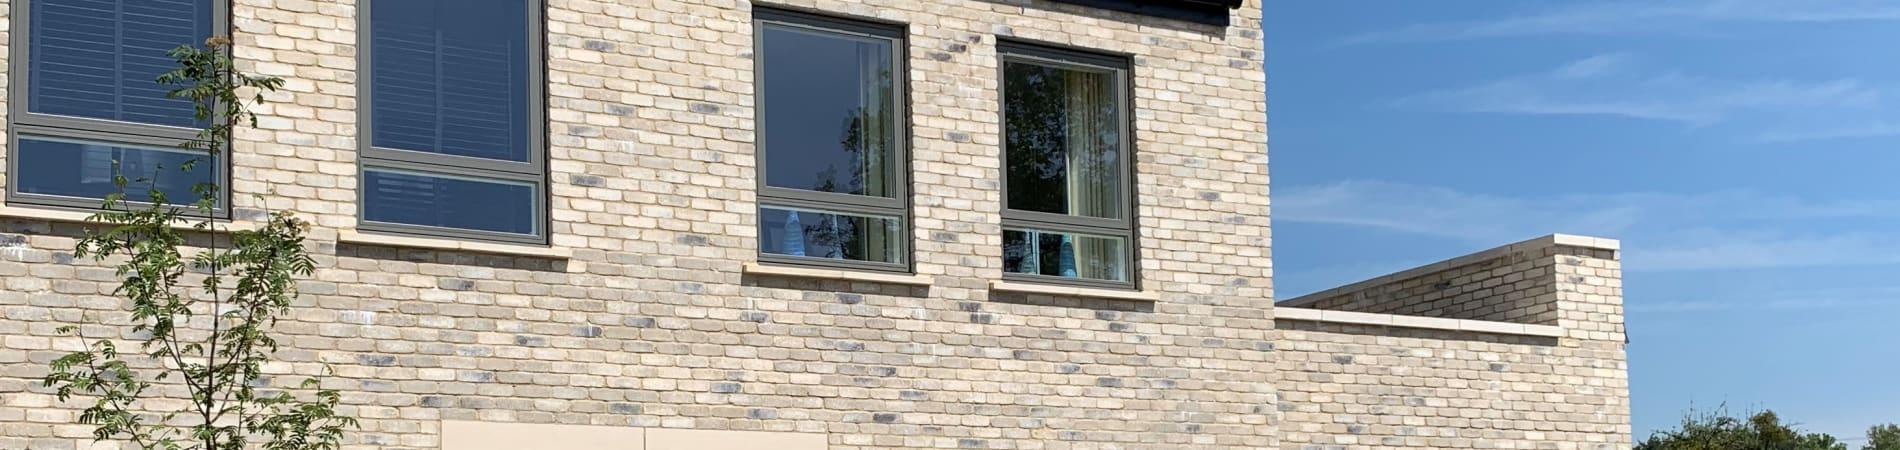 New Marshalls Bricks and Masonry division is launched